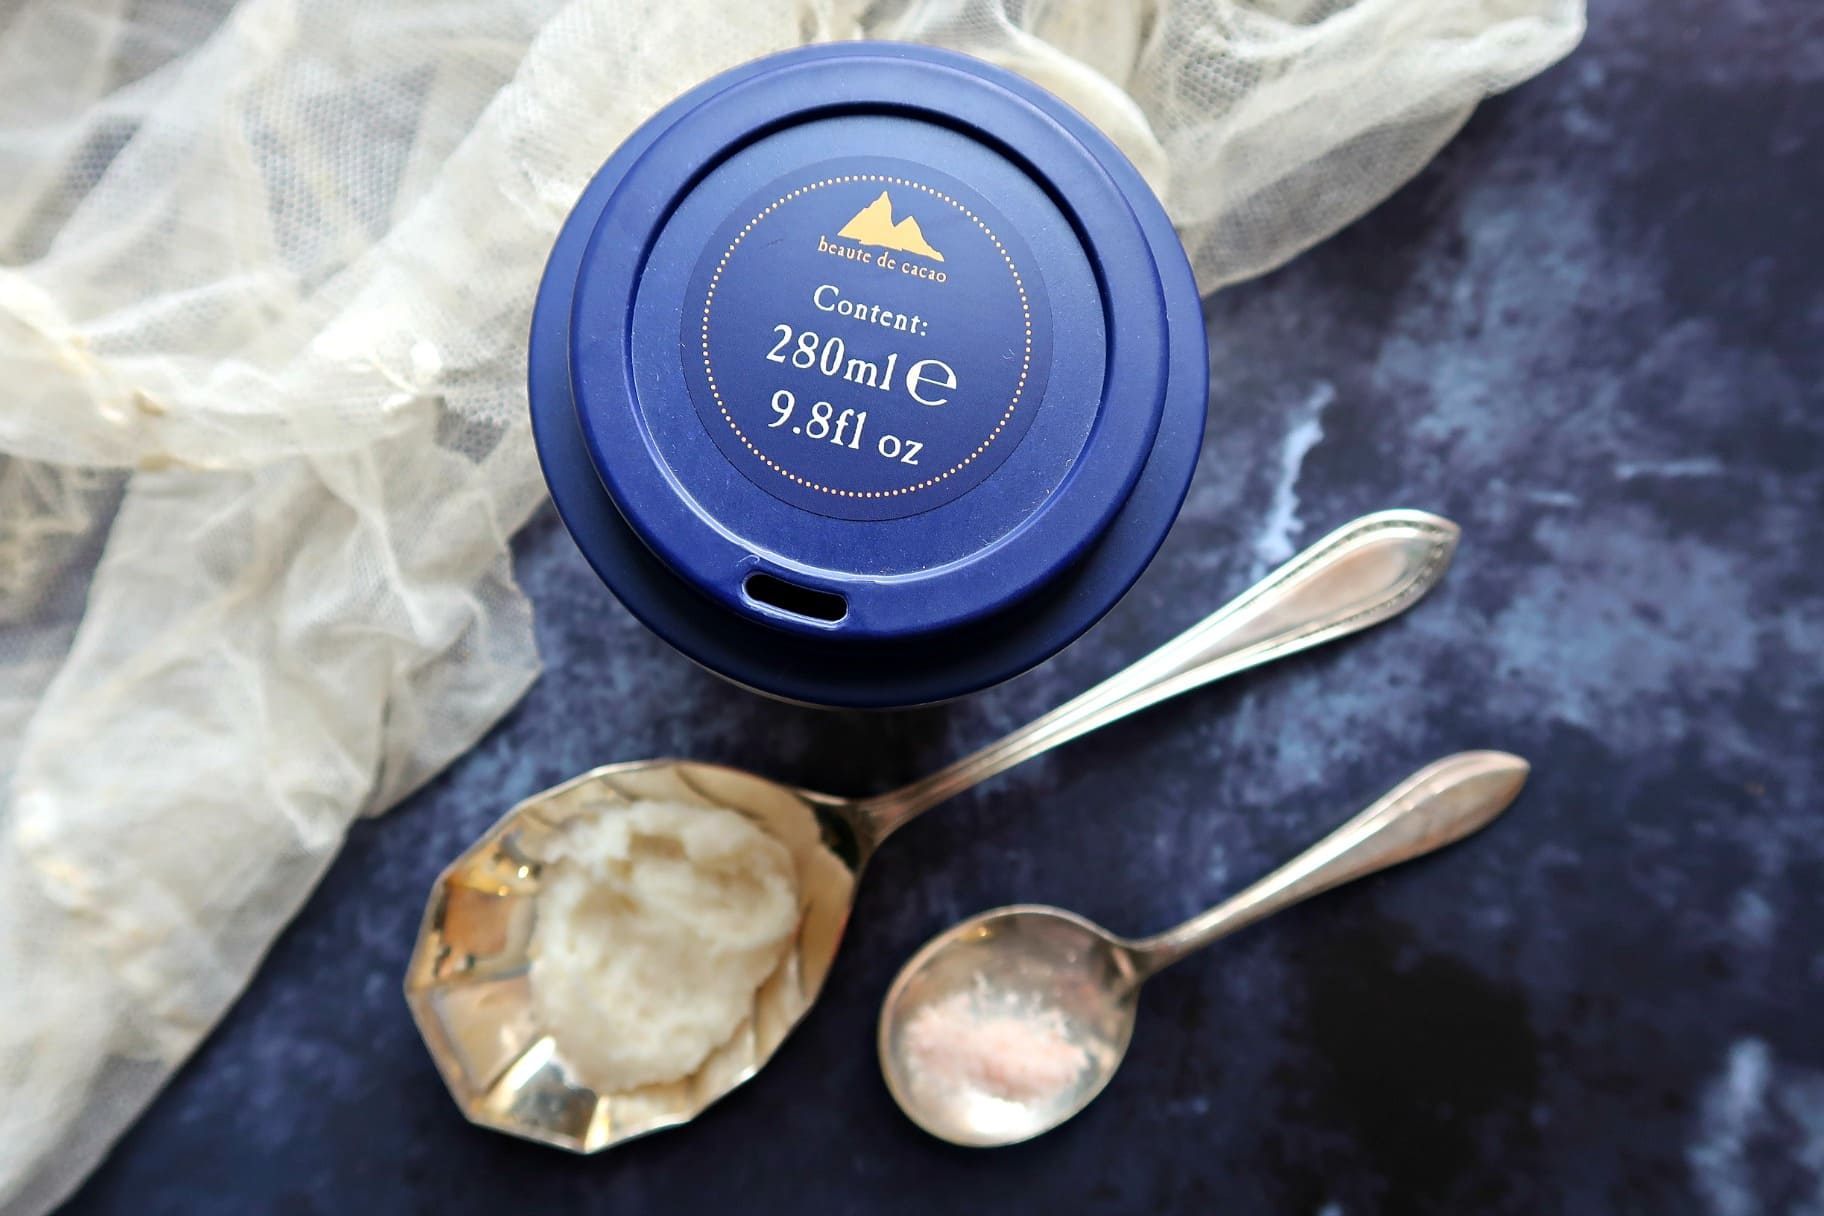 Rabot 1745 salt scrub